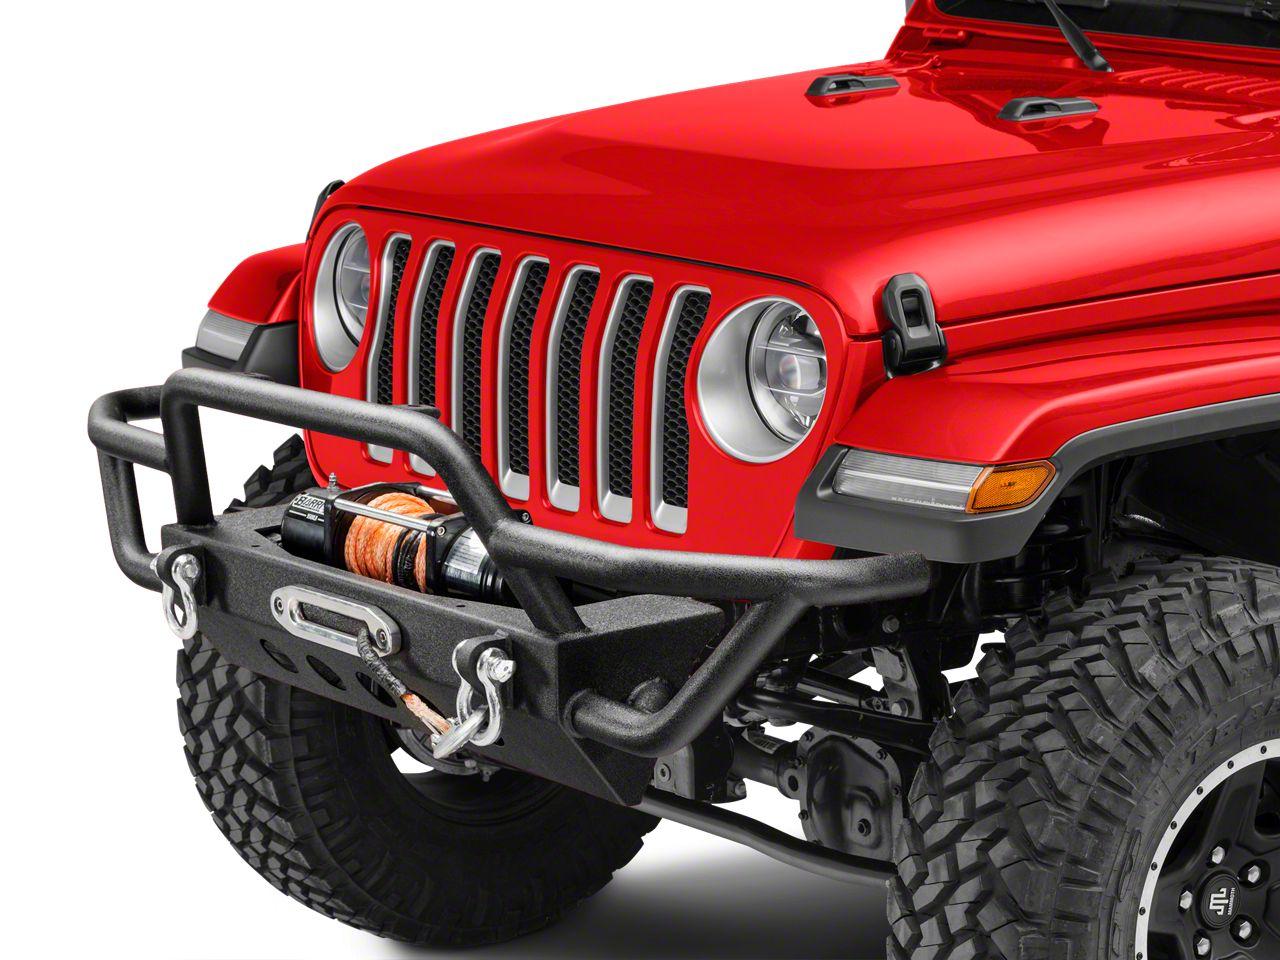 RedRock 4x4 Rock Crawler Front Bumper (18-19 Jeep Wrangler JL)